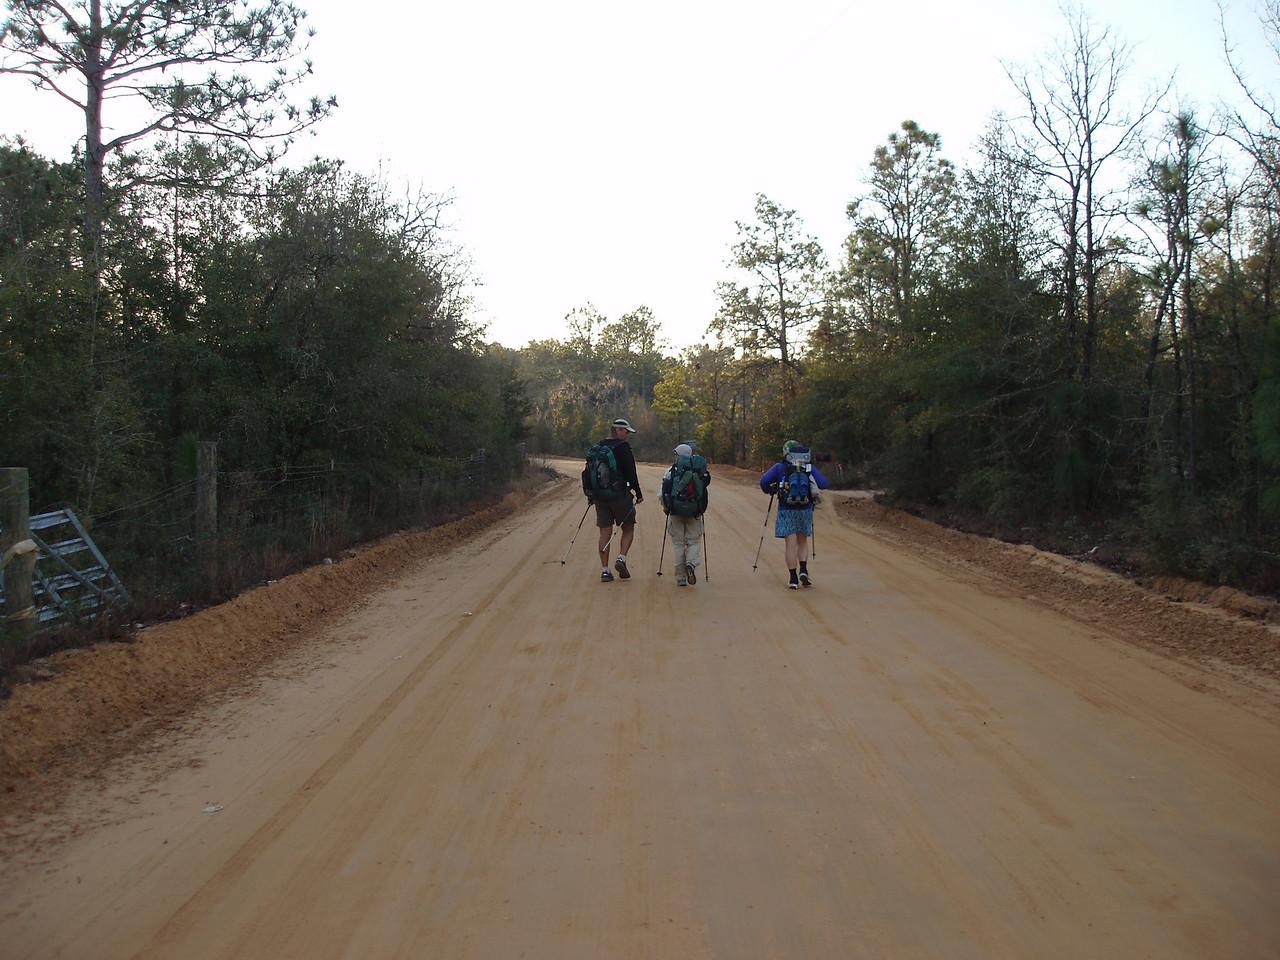 Hiking back roads in Washington County<br /> PHOTO CREDIT: Robert Coveney / Florida Trail Association